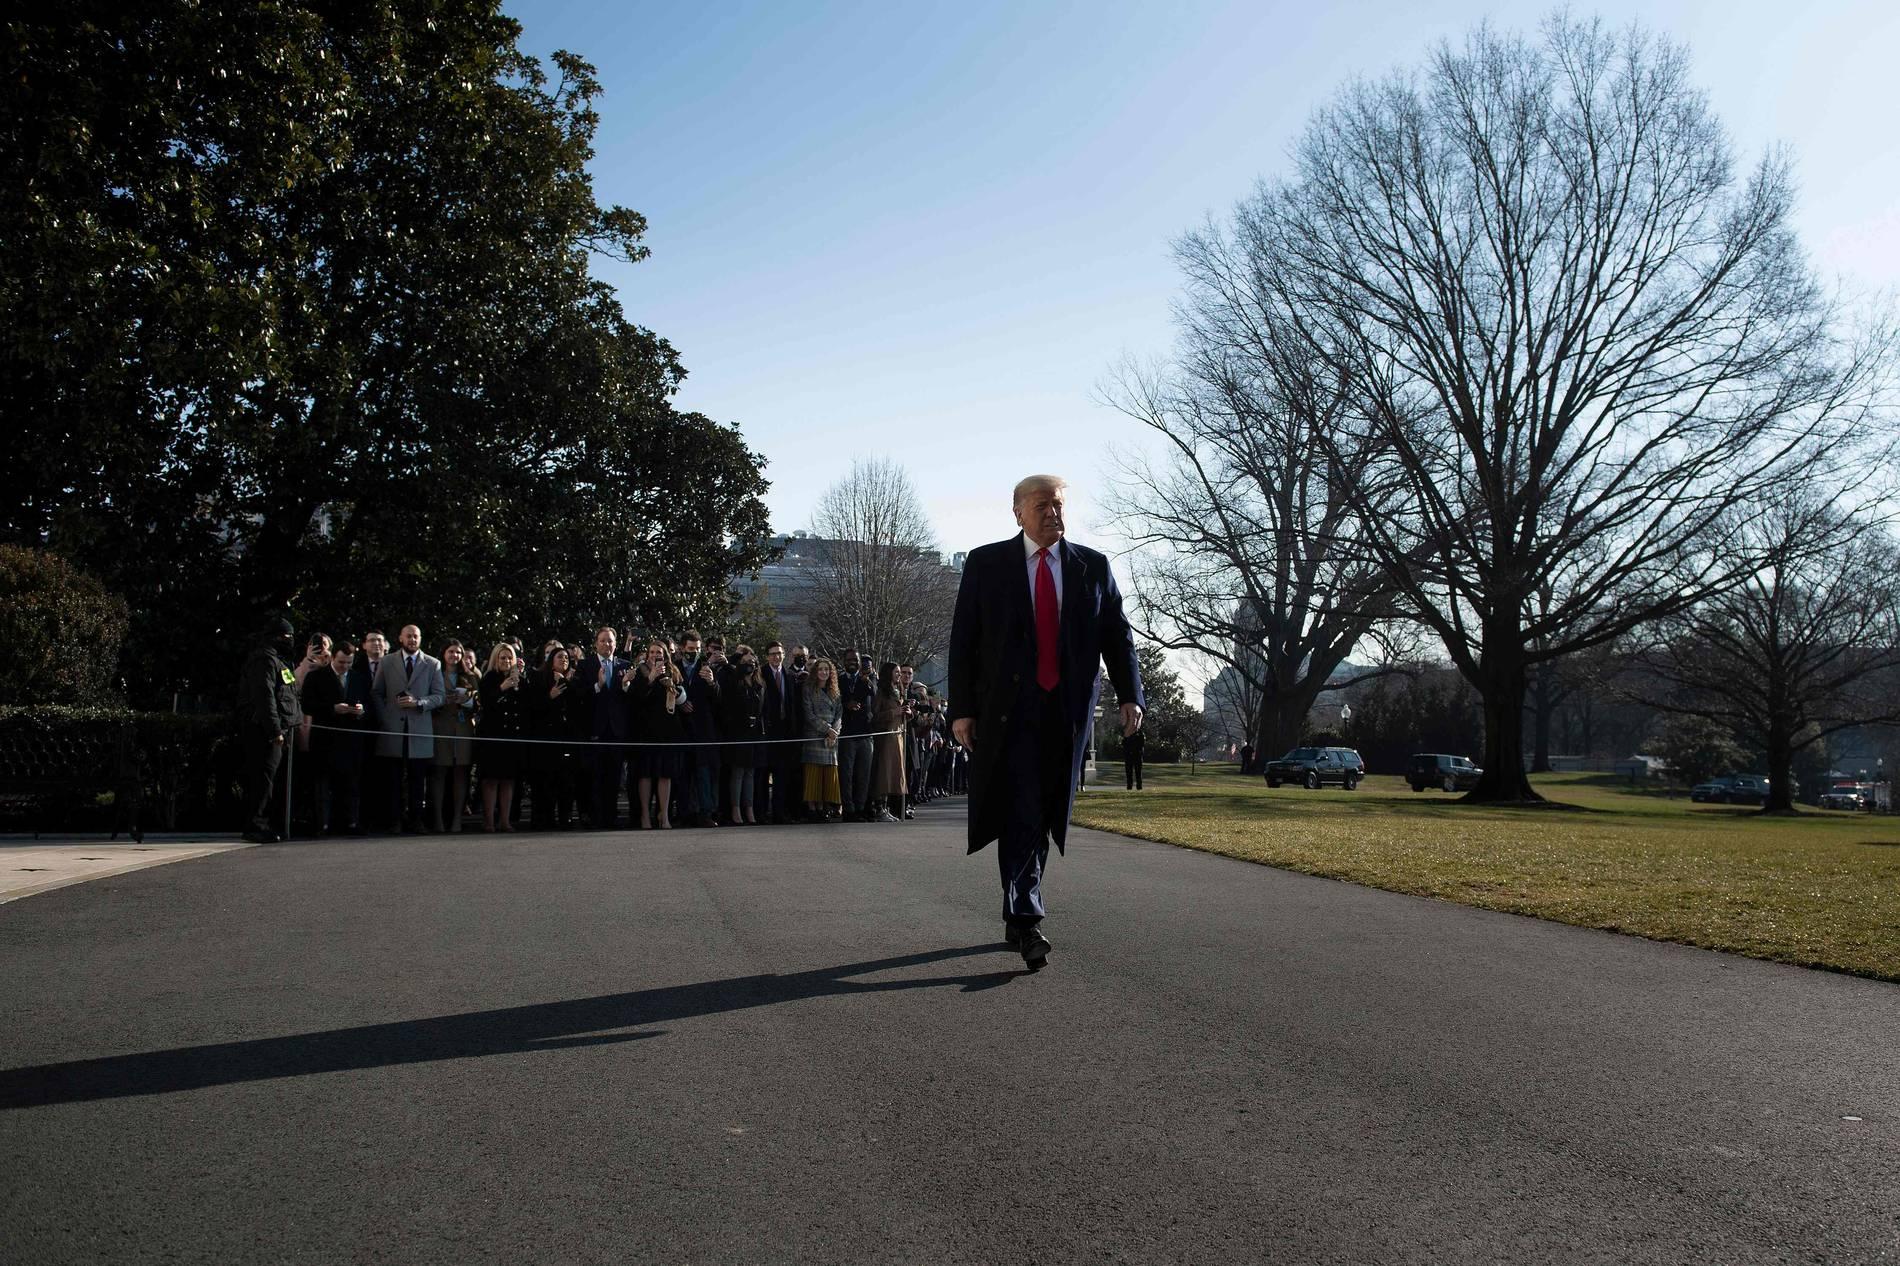 Donald Trump - US-Präsident verteidigt Rede vor Erstürmung des Kapitols